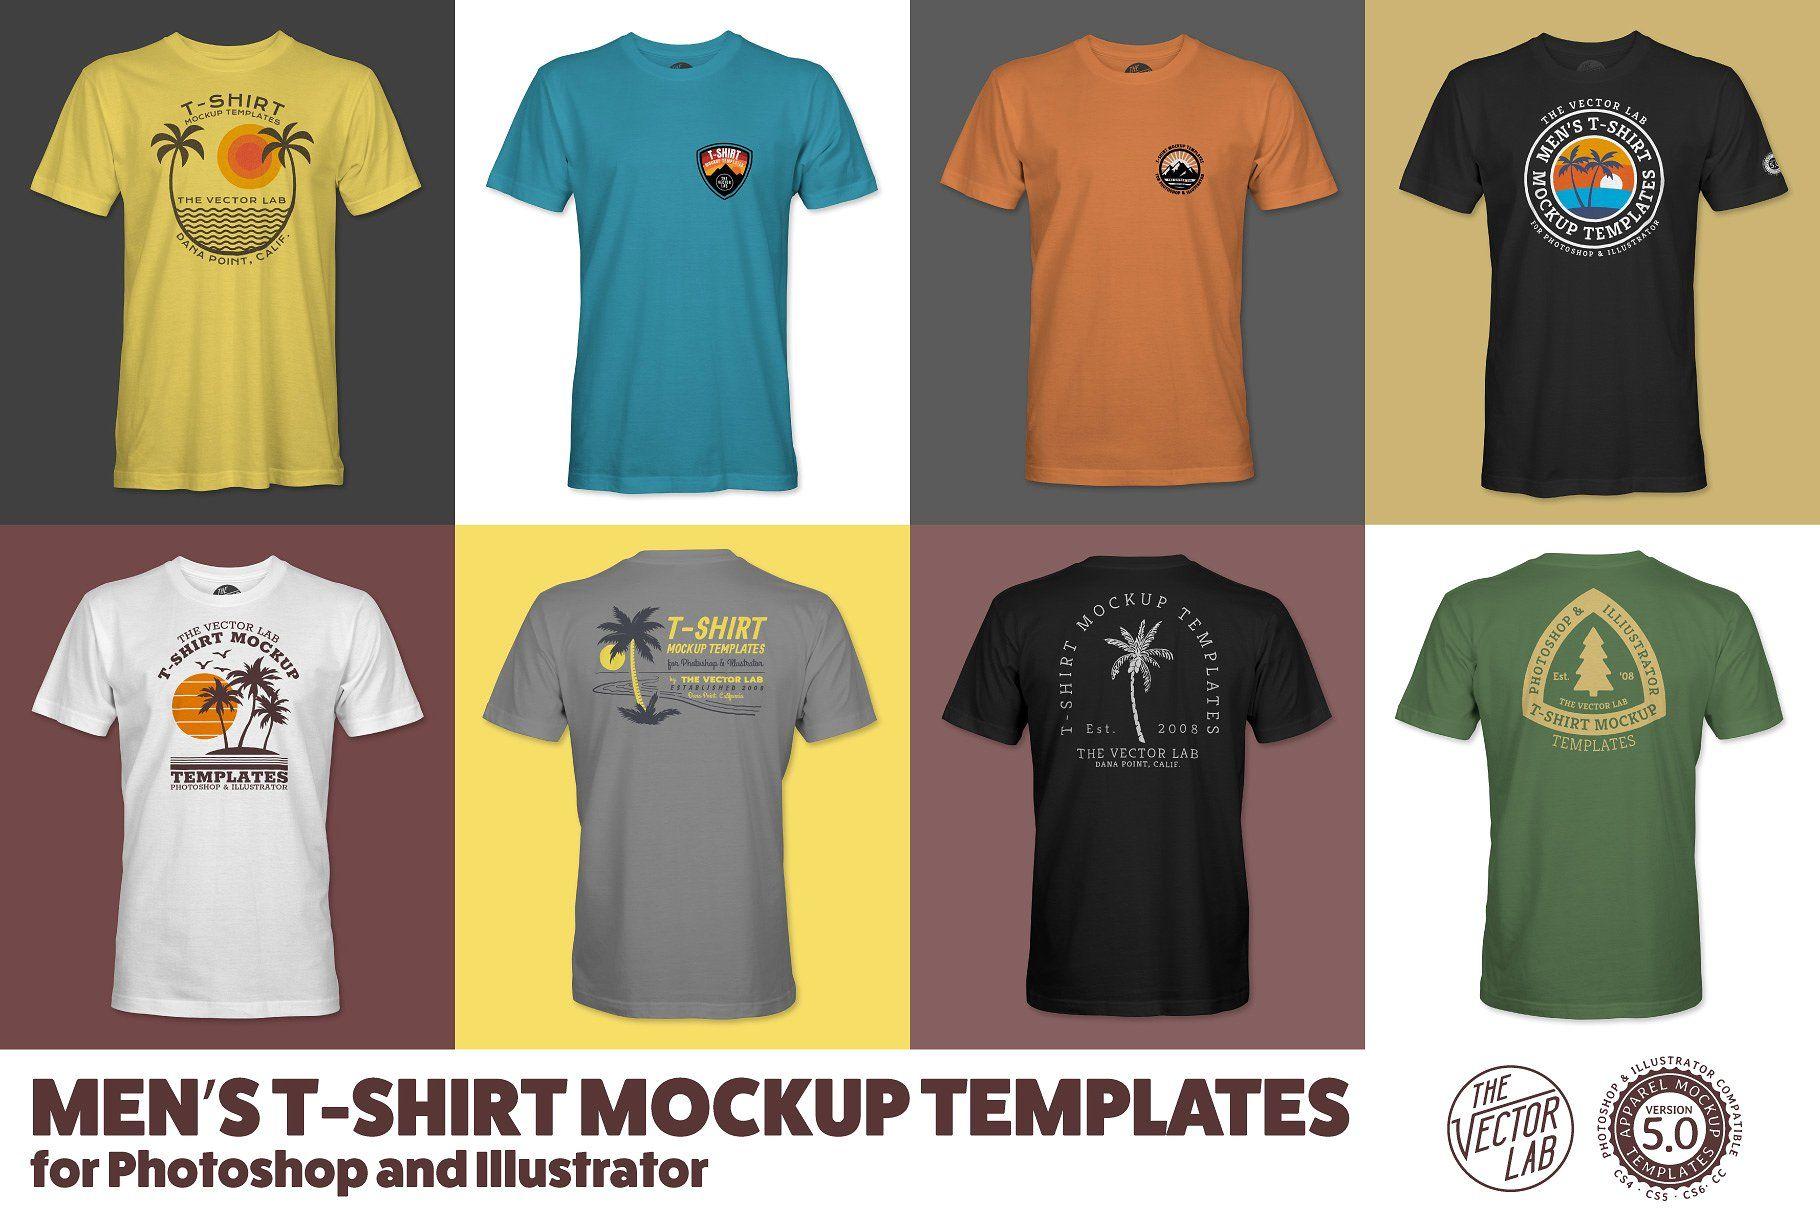 Men S T Shirt Templates Version 5 0 Shirt Template Clothing Mockup Shirt Mockup